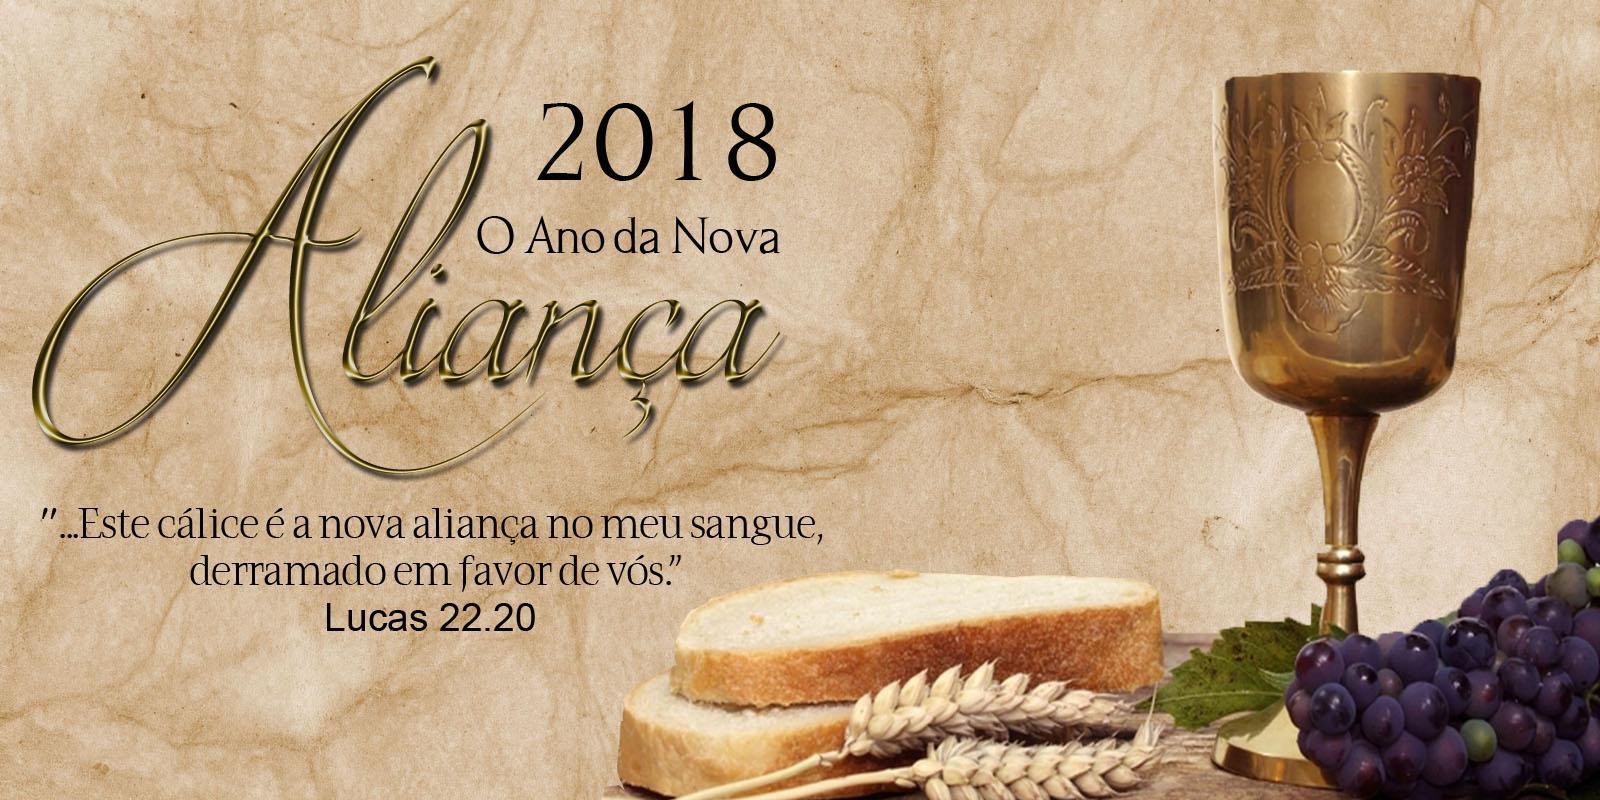 2018 - O Ano da Nova Aliança